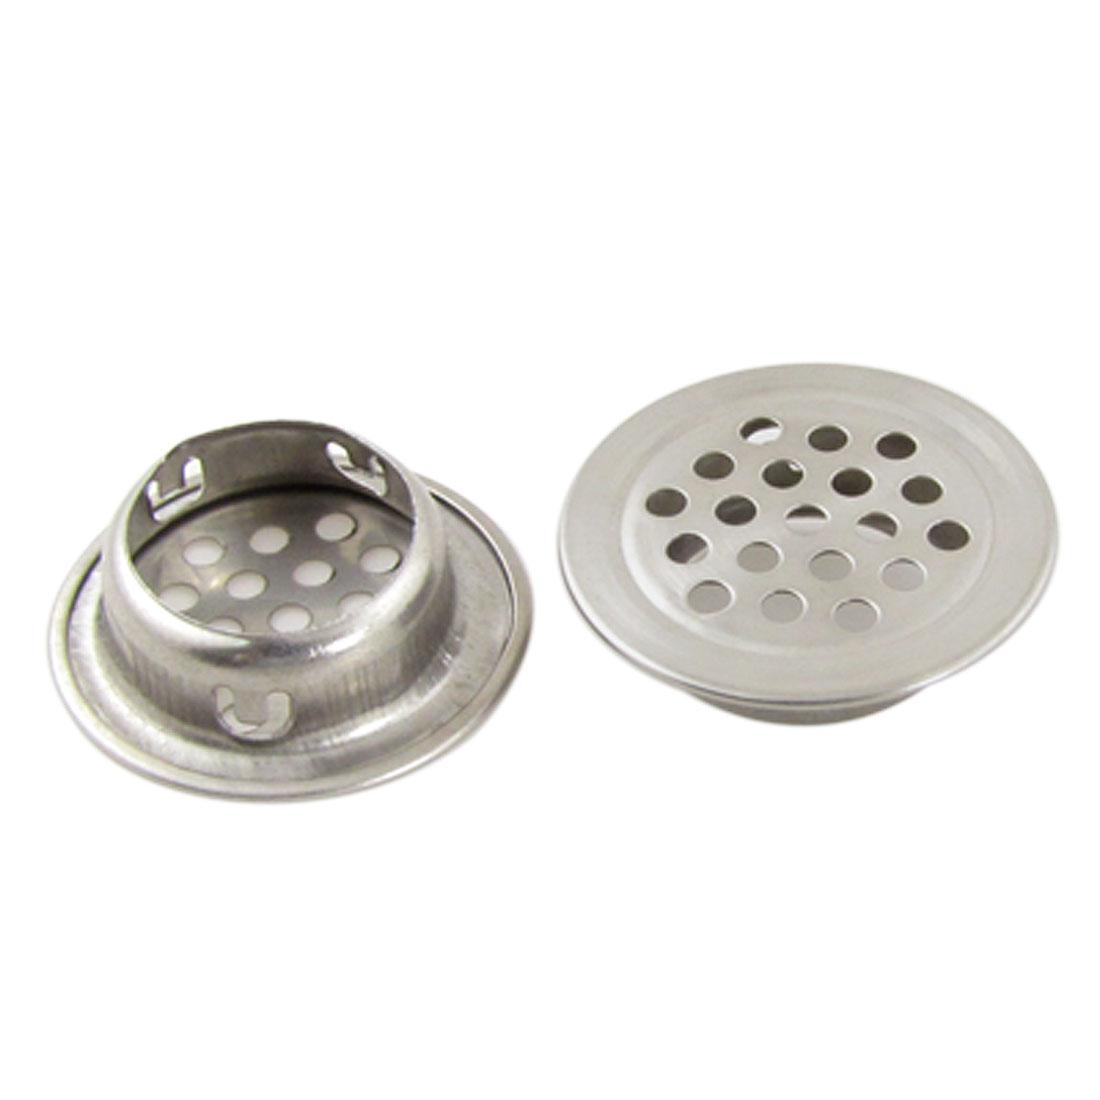 2 Pcs Kitchen Bathroom Hole Design 1 3 Sink Drain Strainers Walmart Com